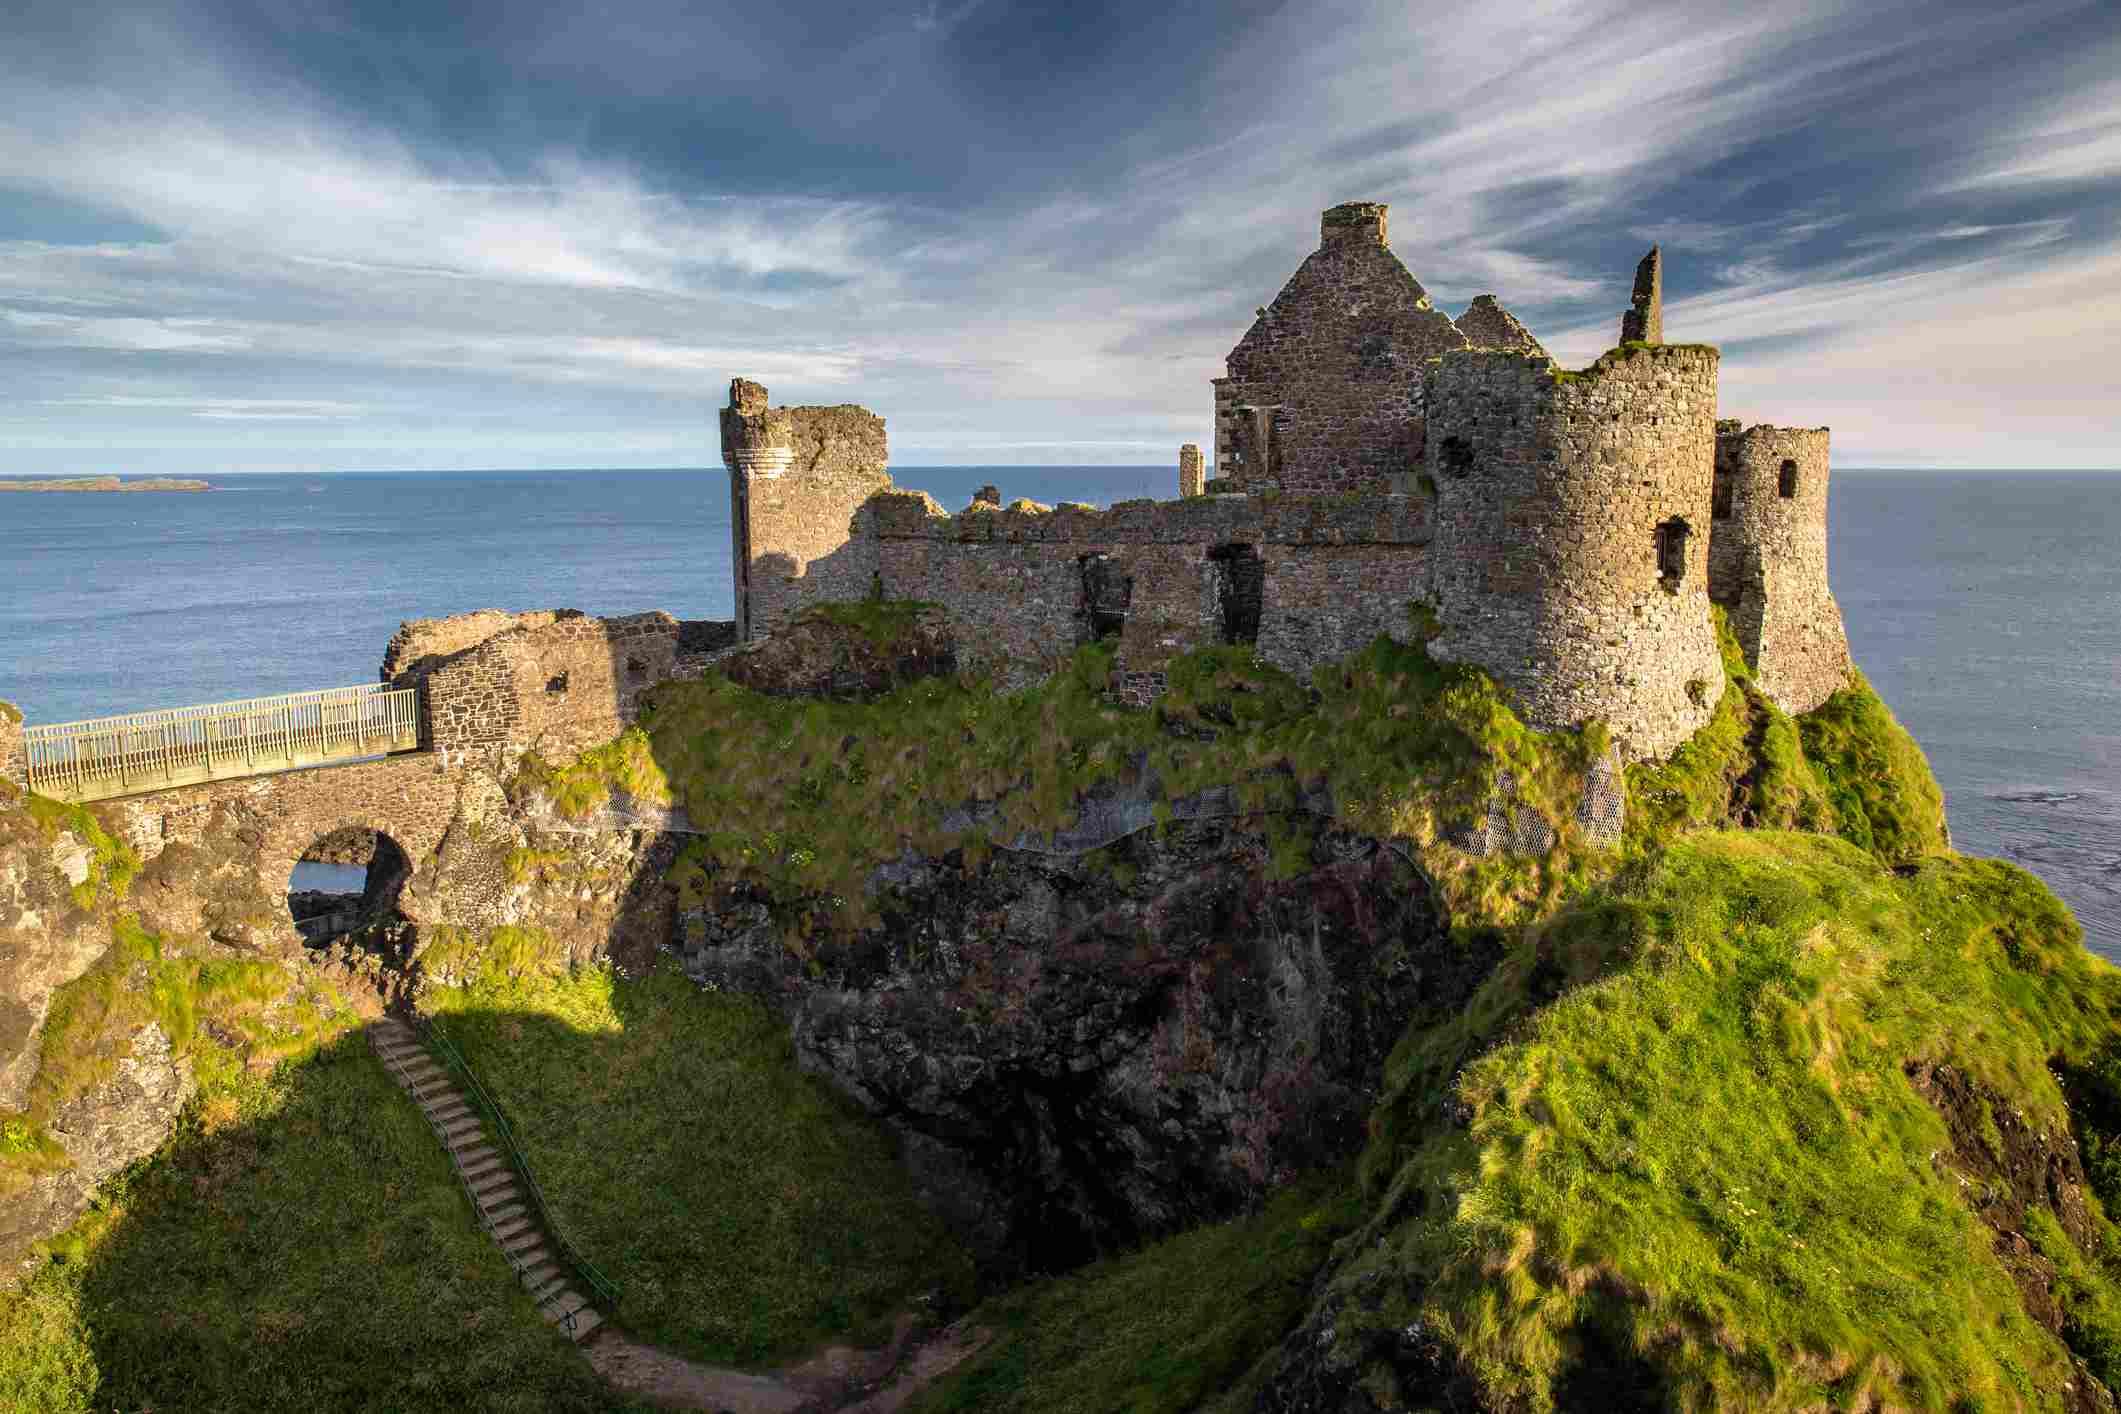 Ruins of Dunluce Castle, Northern Ireland, Co. Antrim